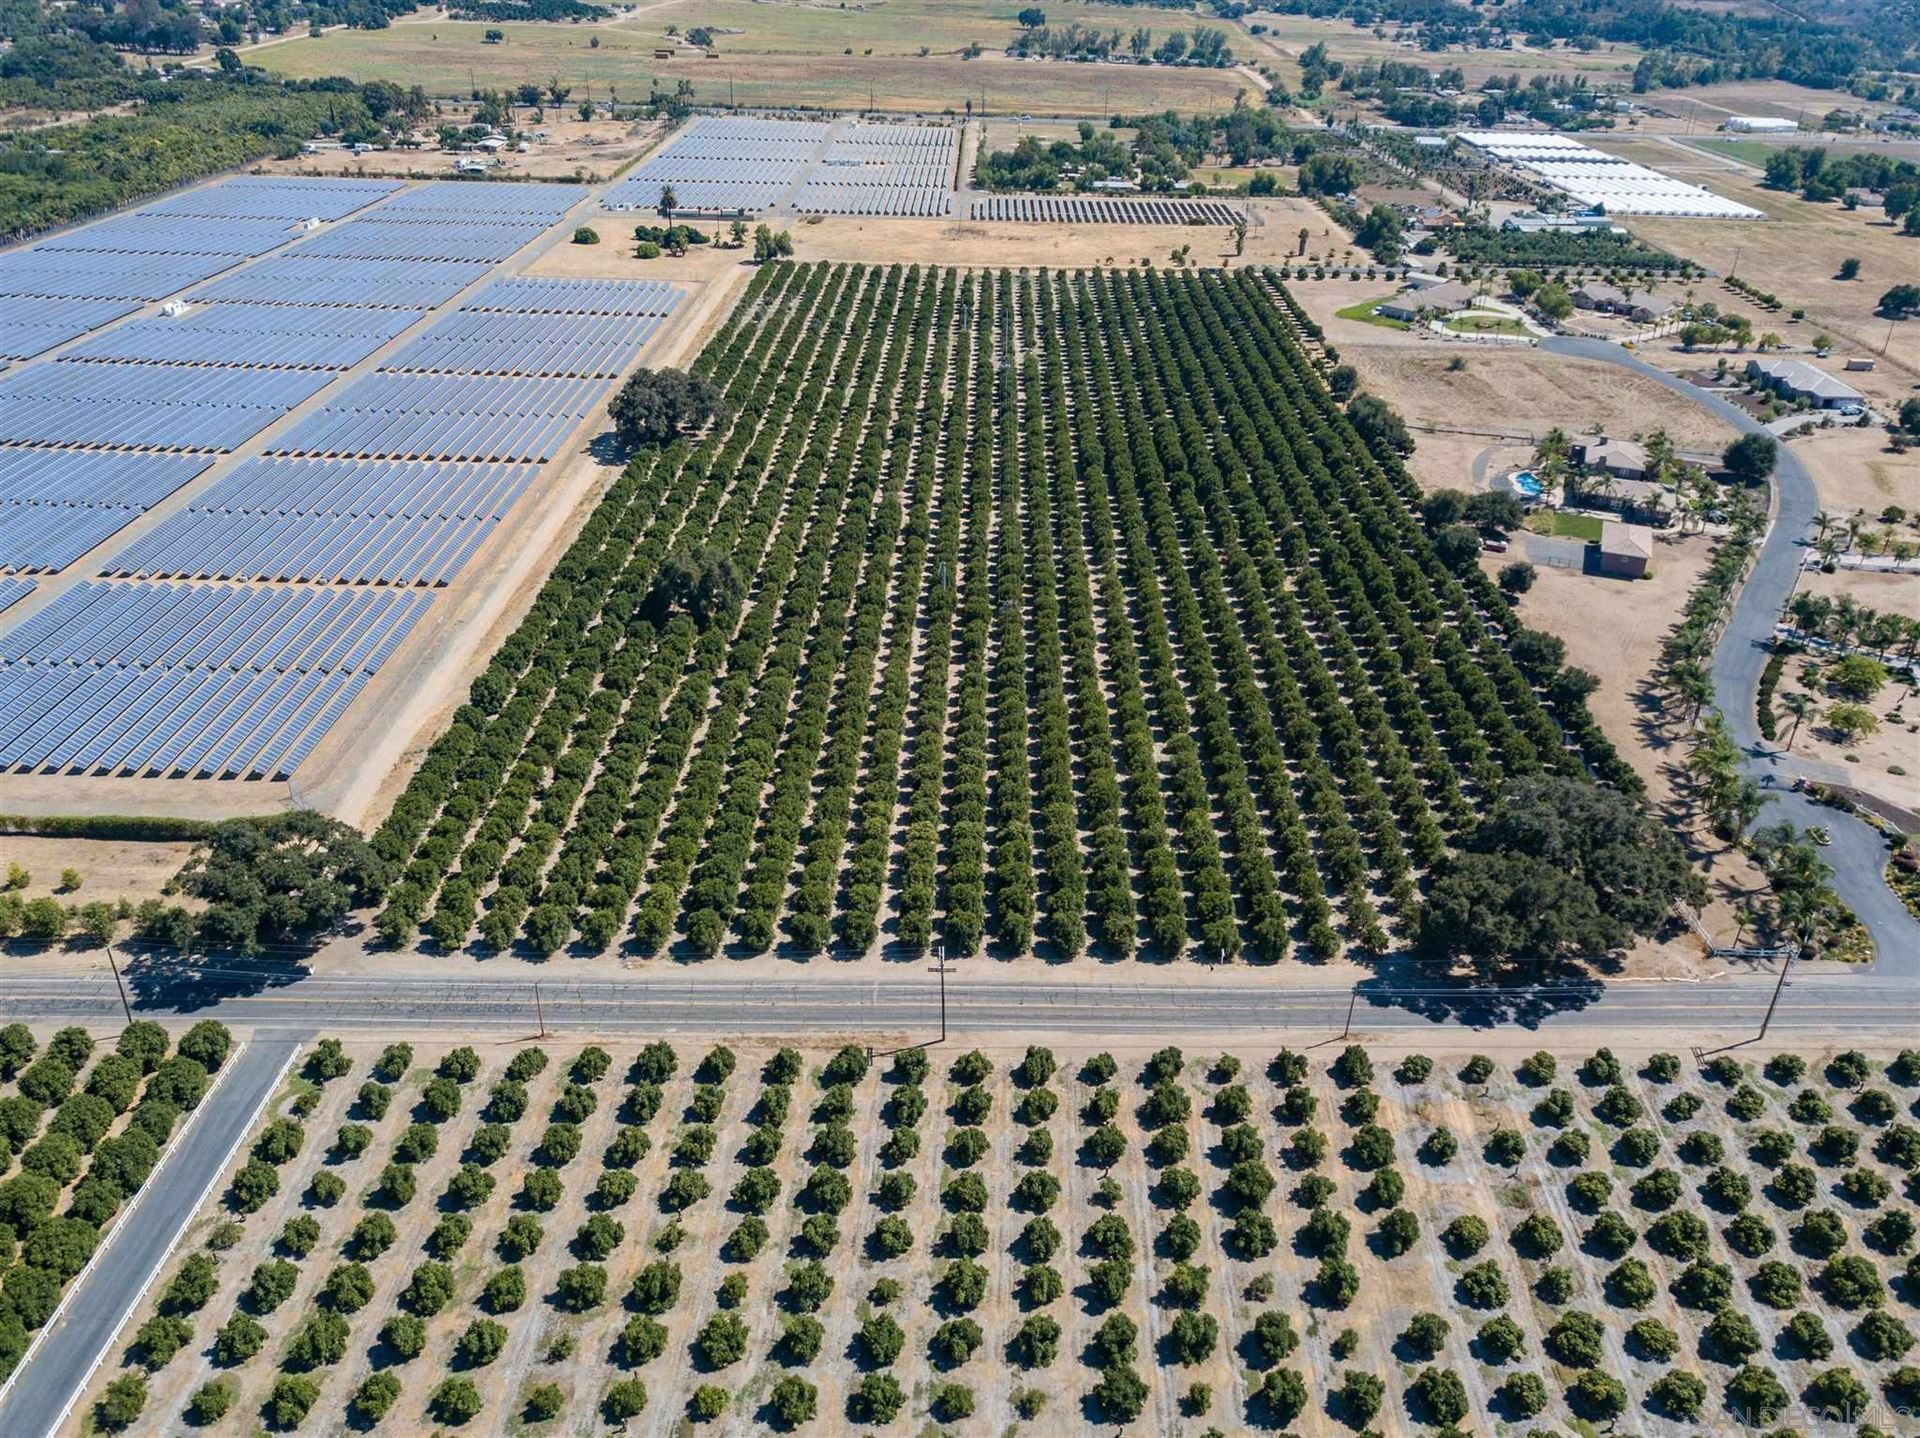 Photo of 16.49 acres on Vesper Rd, Valley Center, CA 92082 (MLS # 210012189)